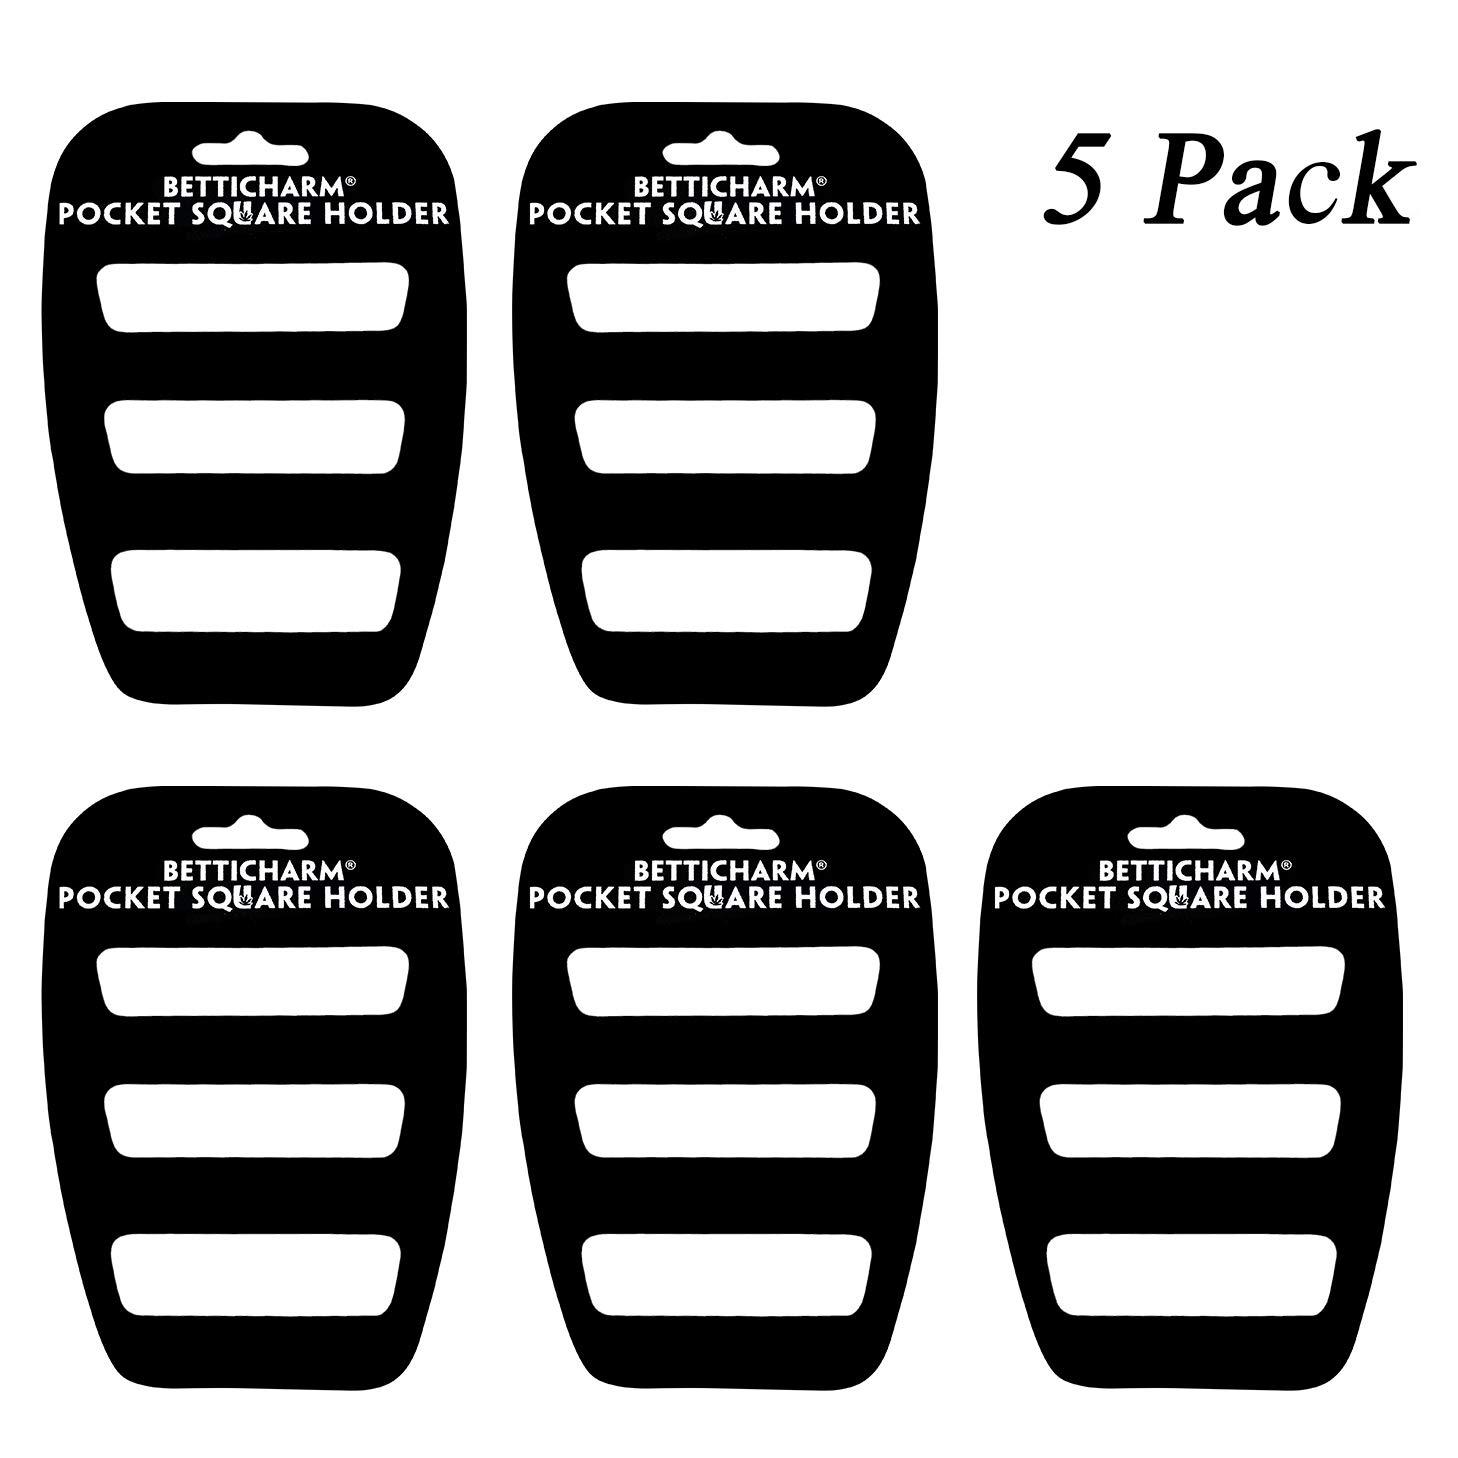 BettiCharm Slim Pocket Square Holders, Men's Suit Handkerchiefs Keeper/Organizer (5 Pack)